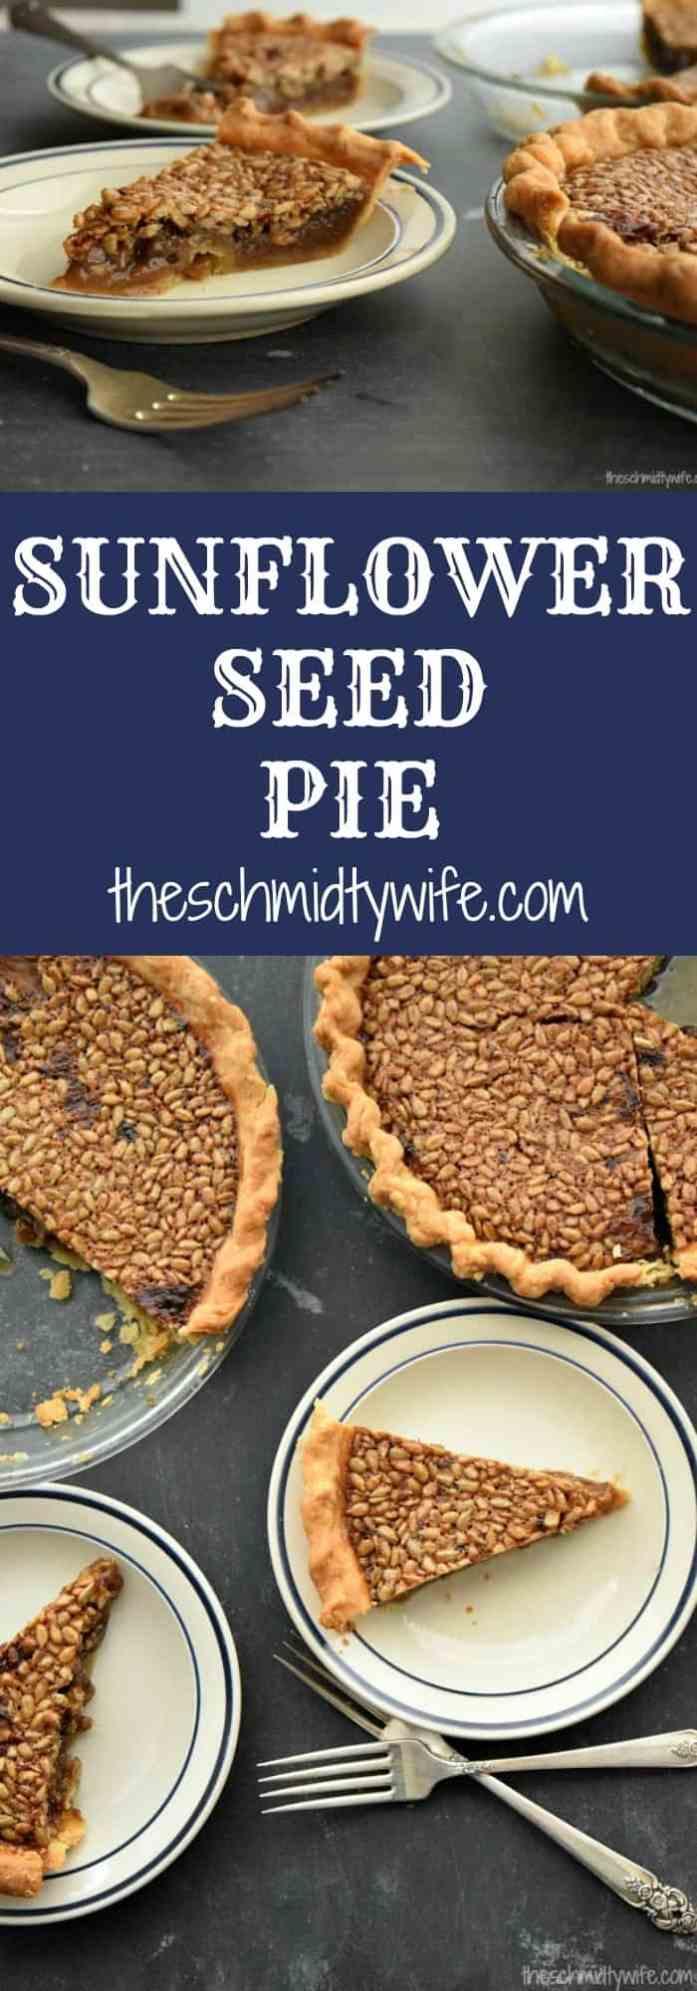 Sunflower Seed Pie